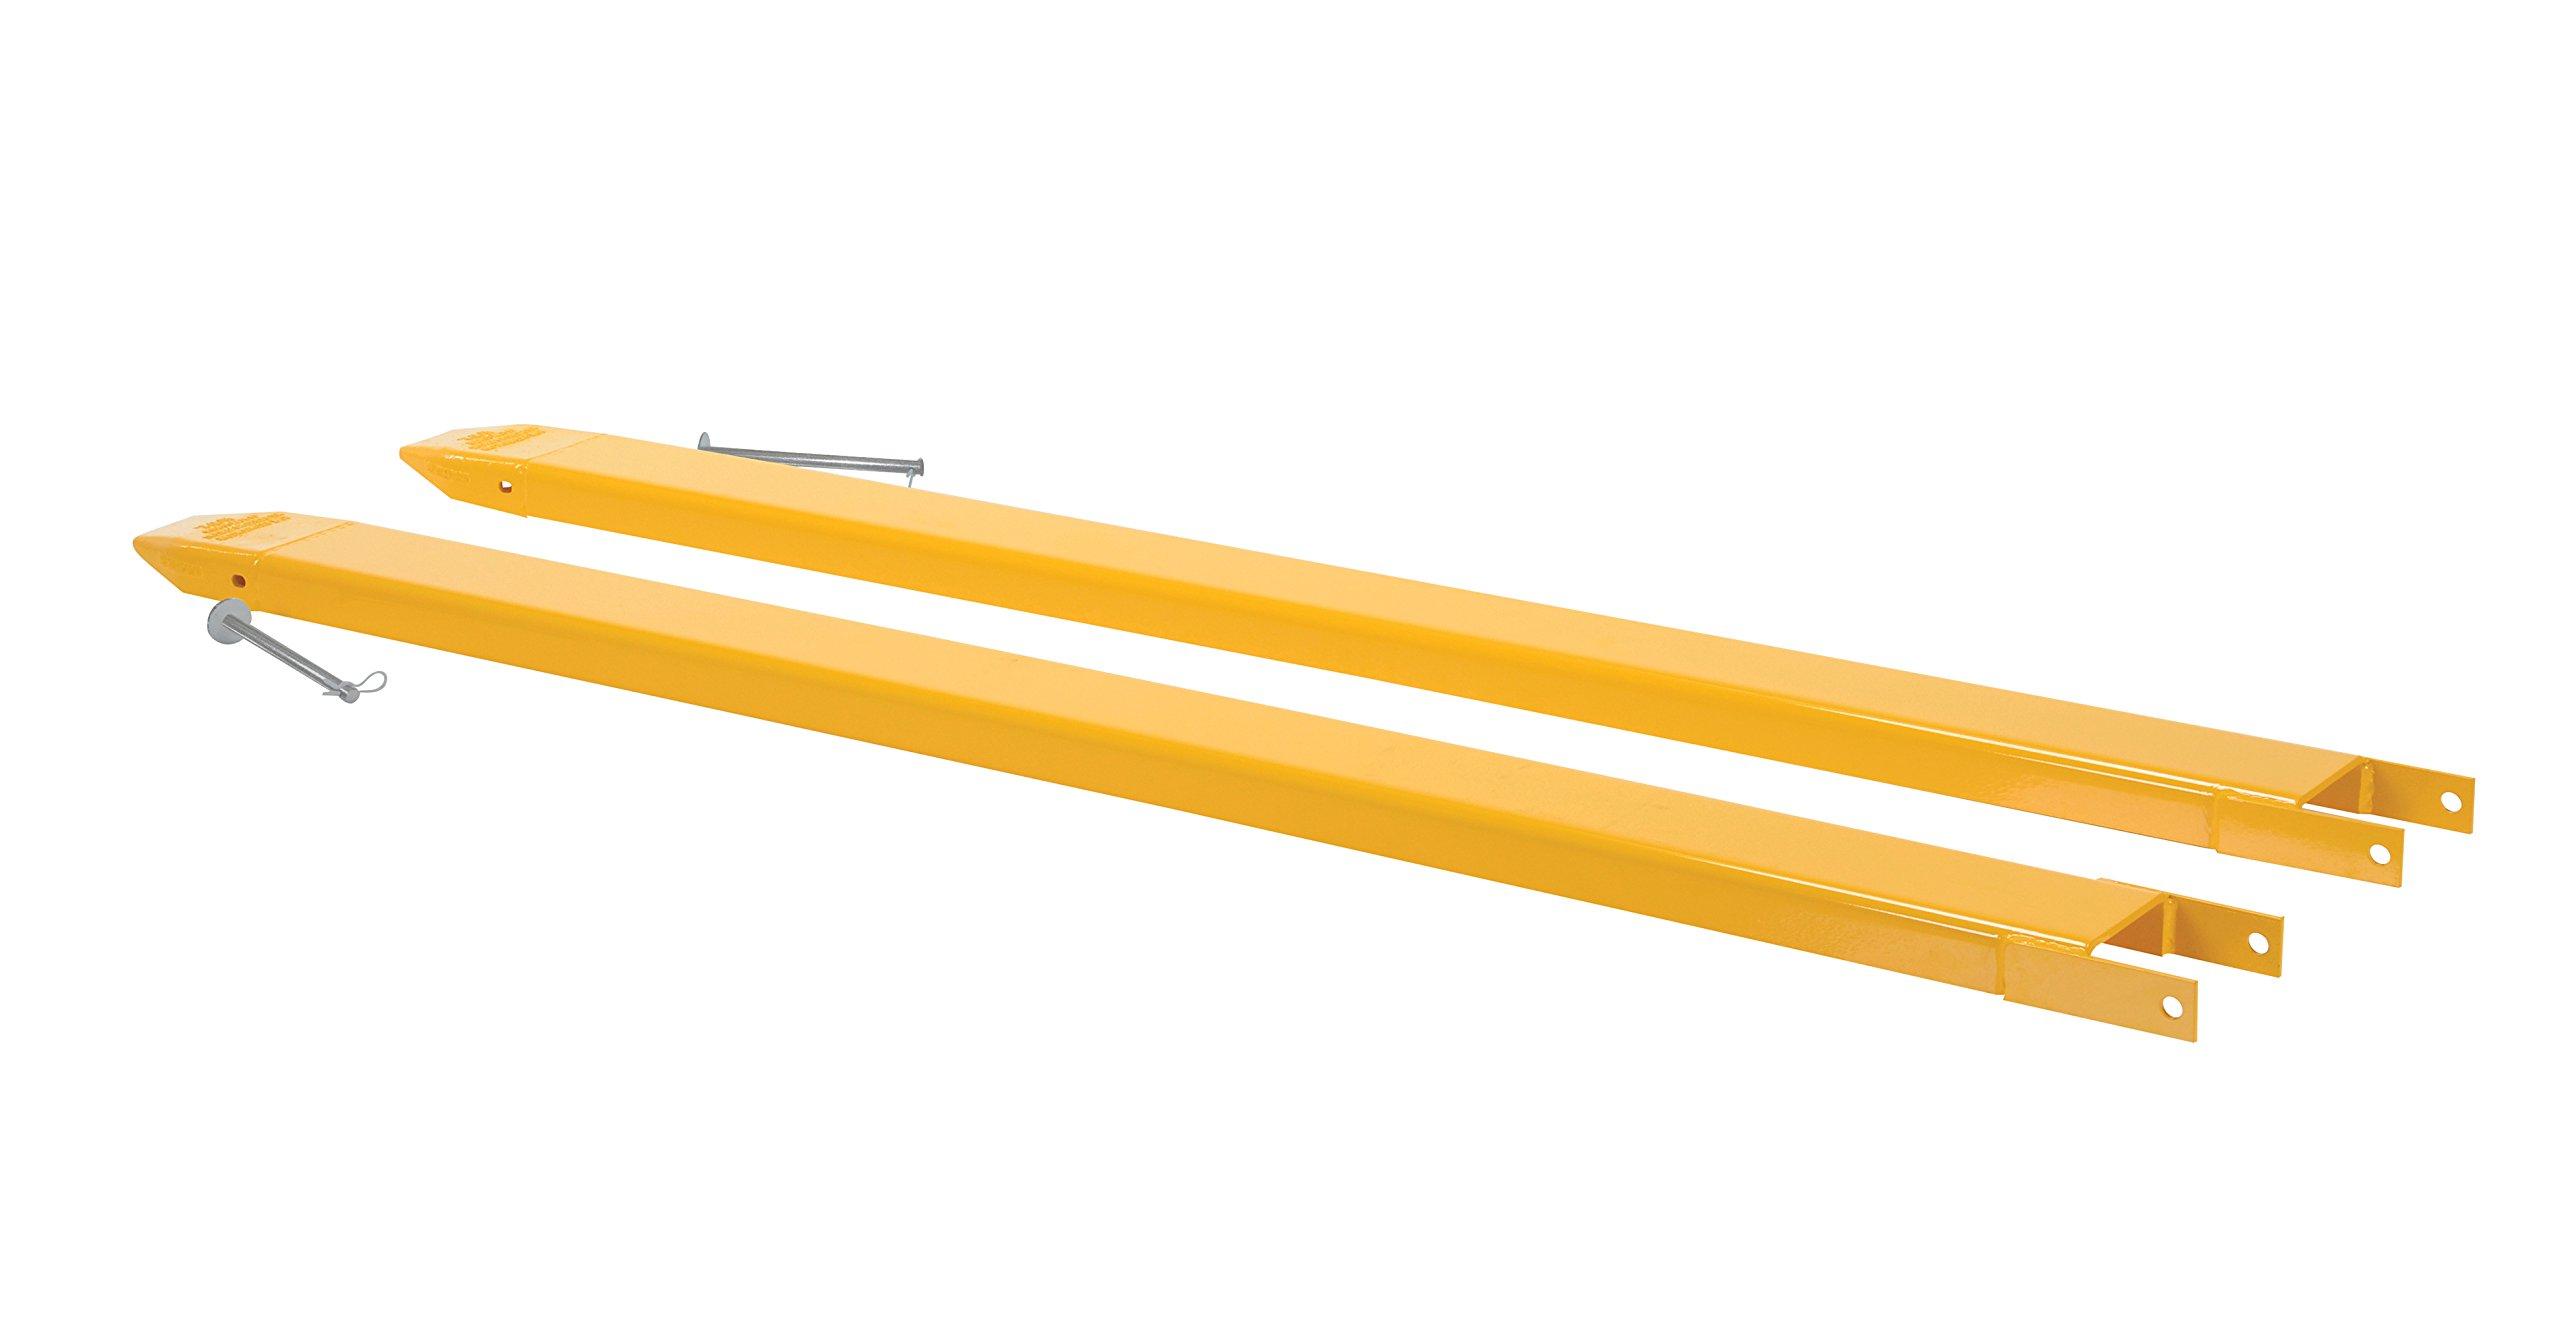 Vestil FORK EXTENSIONS PIN STYLE 84L X 5W IN (FE-5-84-P)